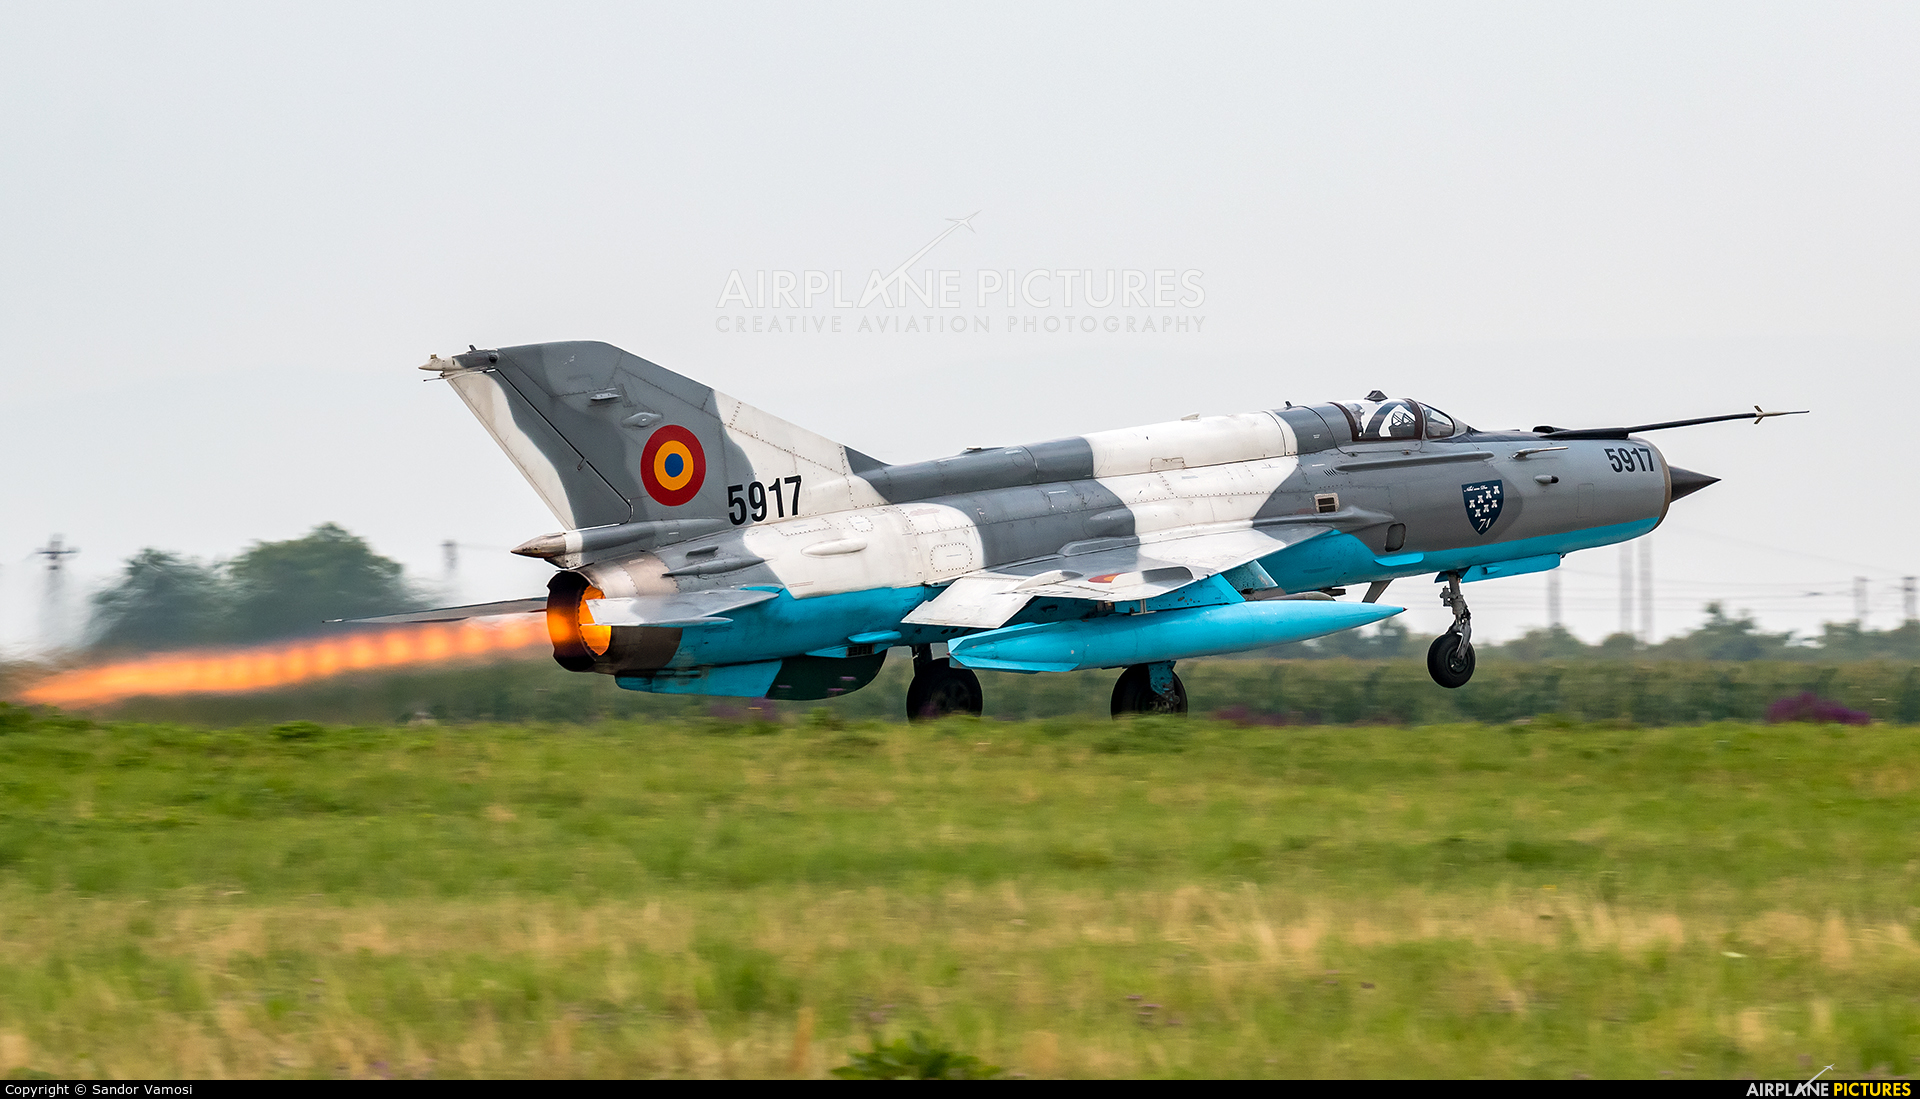 Romania - Air Force 5917 aircraft at Câmpia Turzii